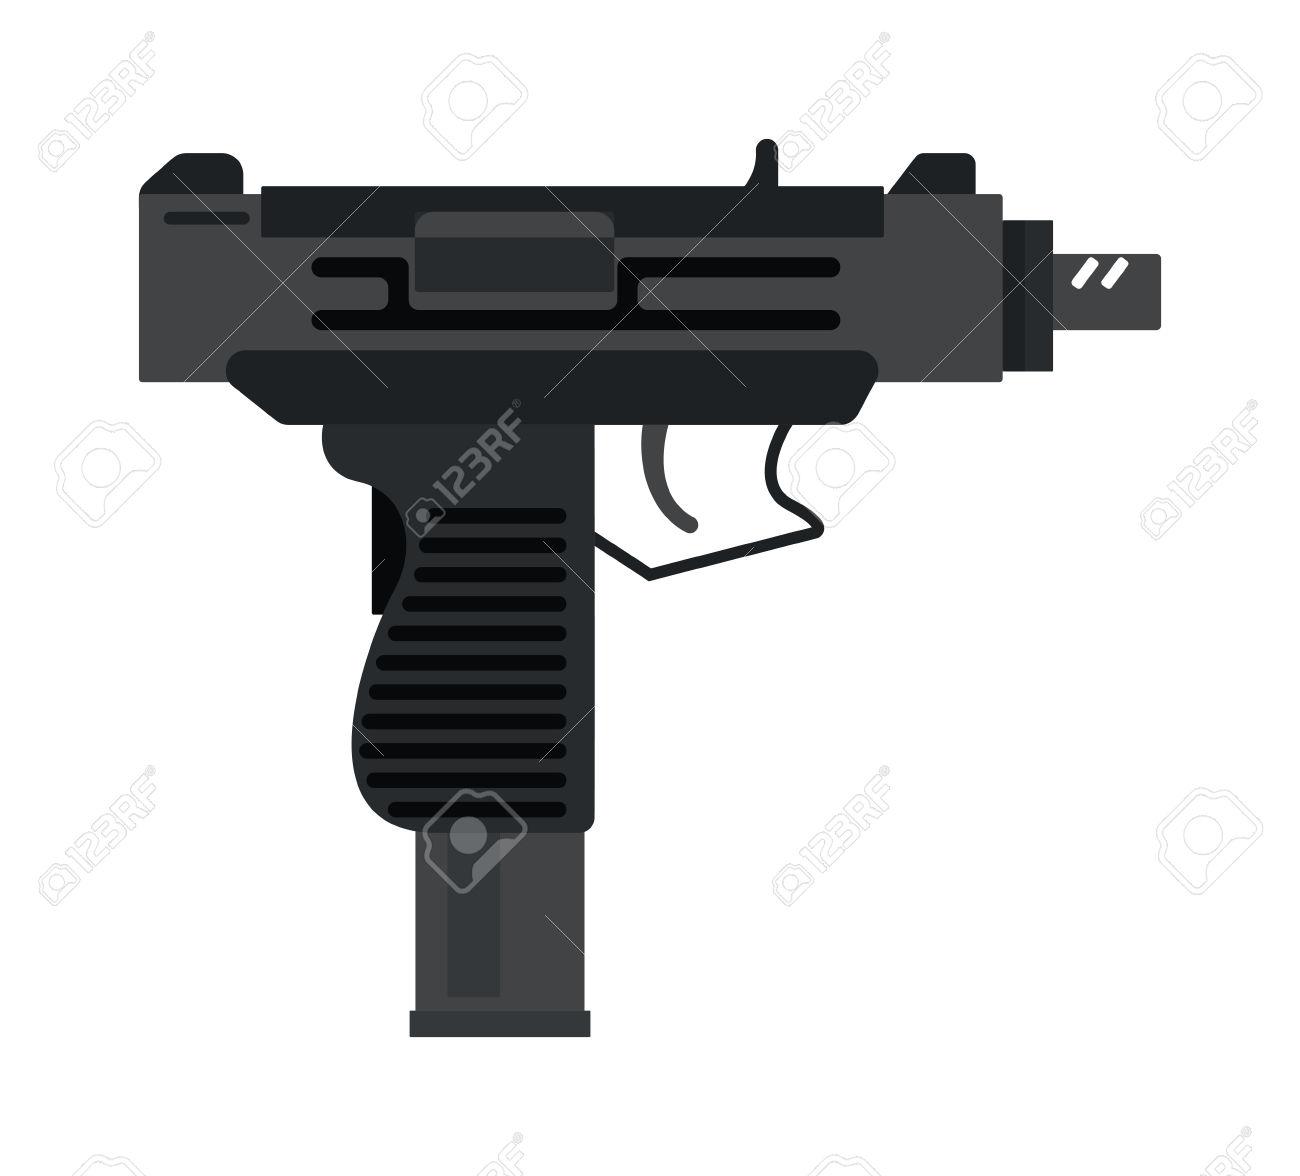 Army gun clipart black background.